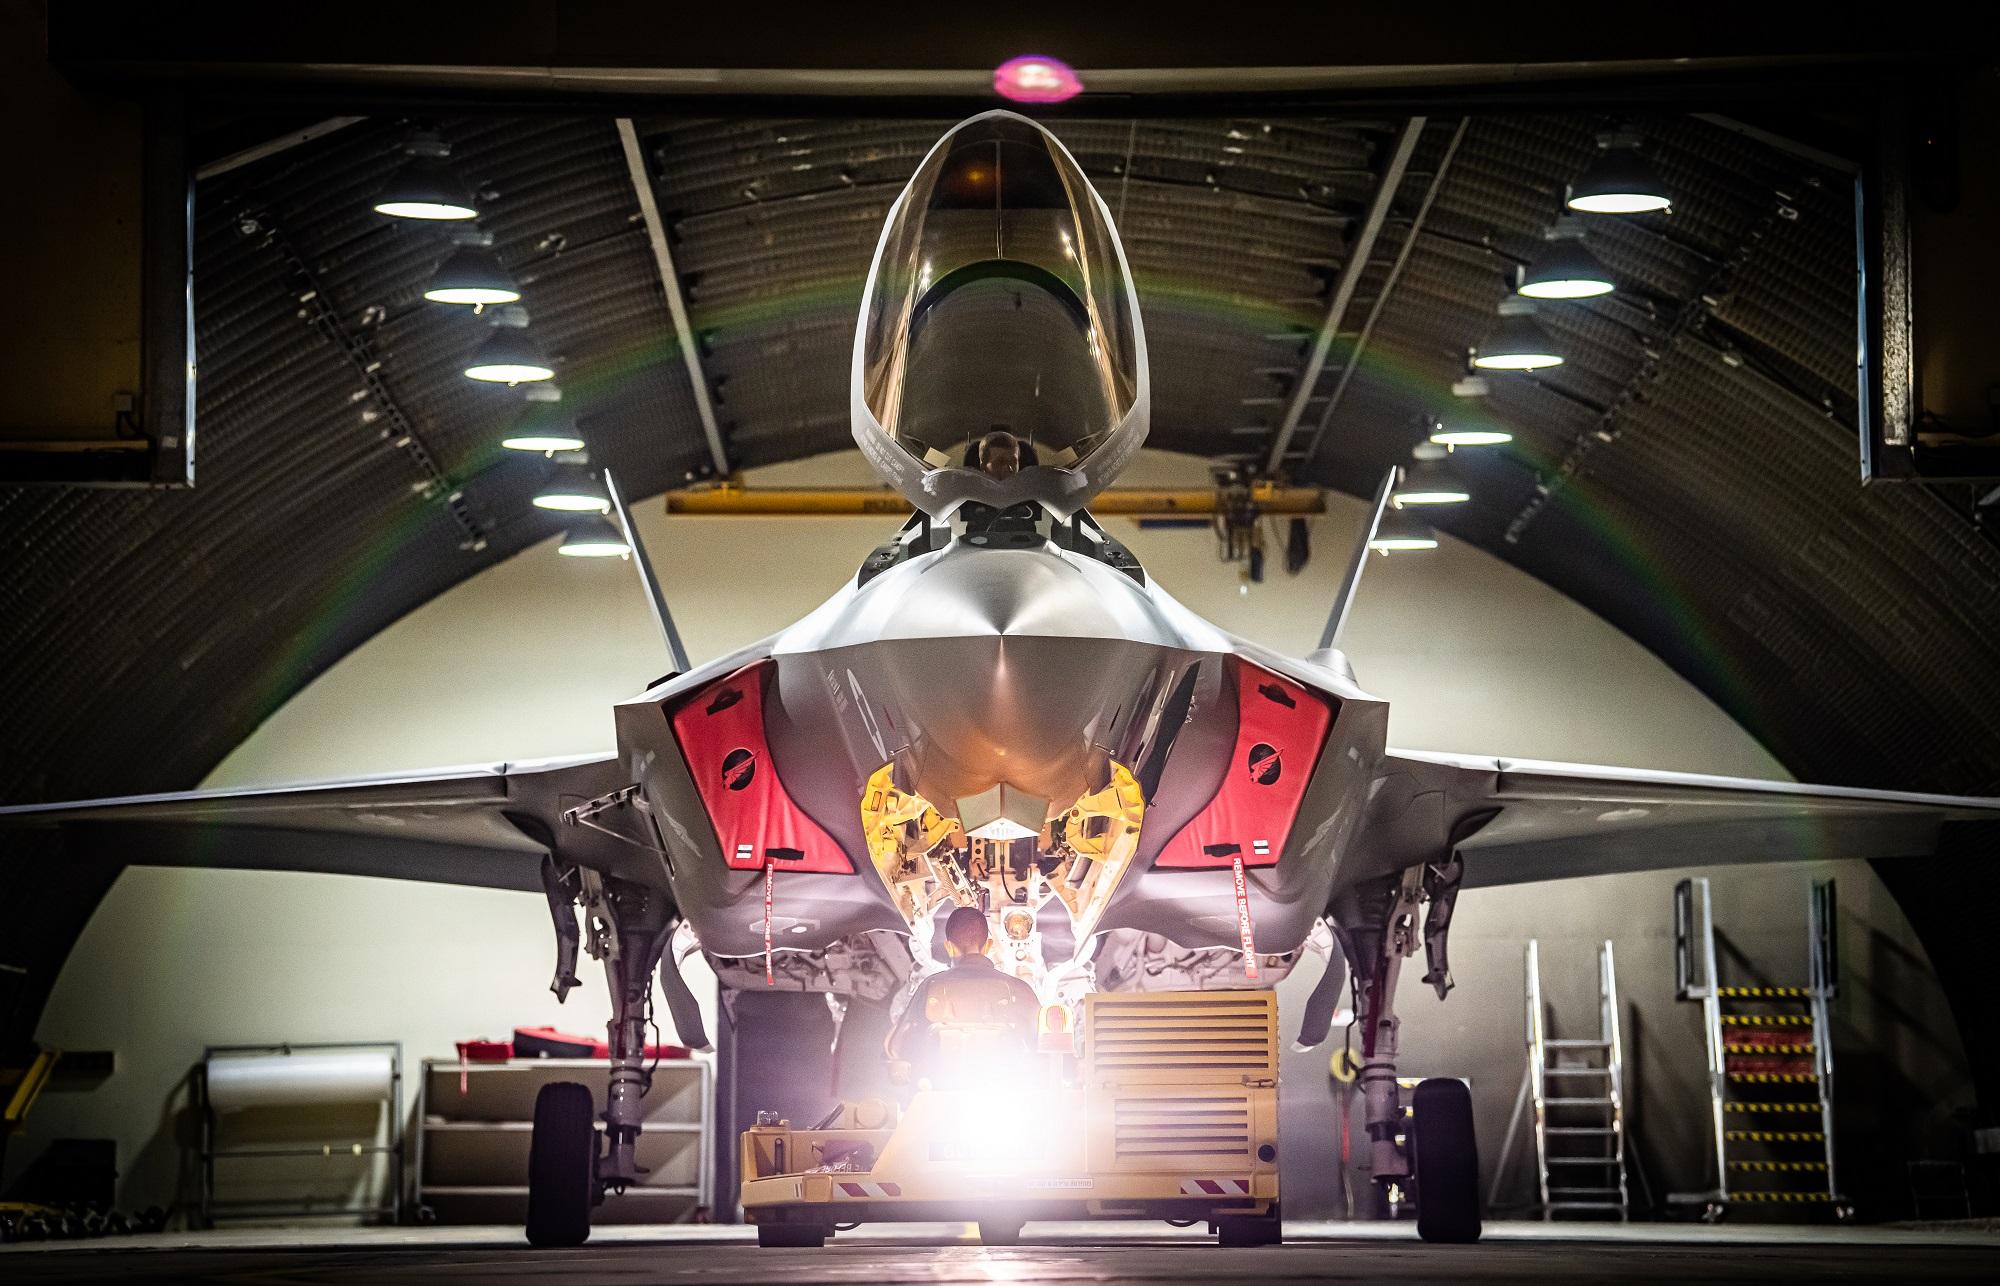 https://i1.wp.com/militaryleak.com/wp-content/uploads/2020/08/israel-air-force-second-f-35i-adir-squadron-becomes-operational-1.jpg?ssl=1